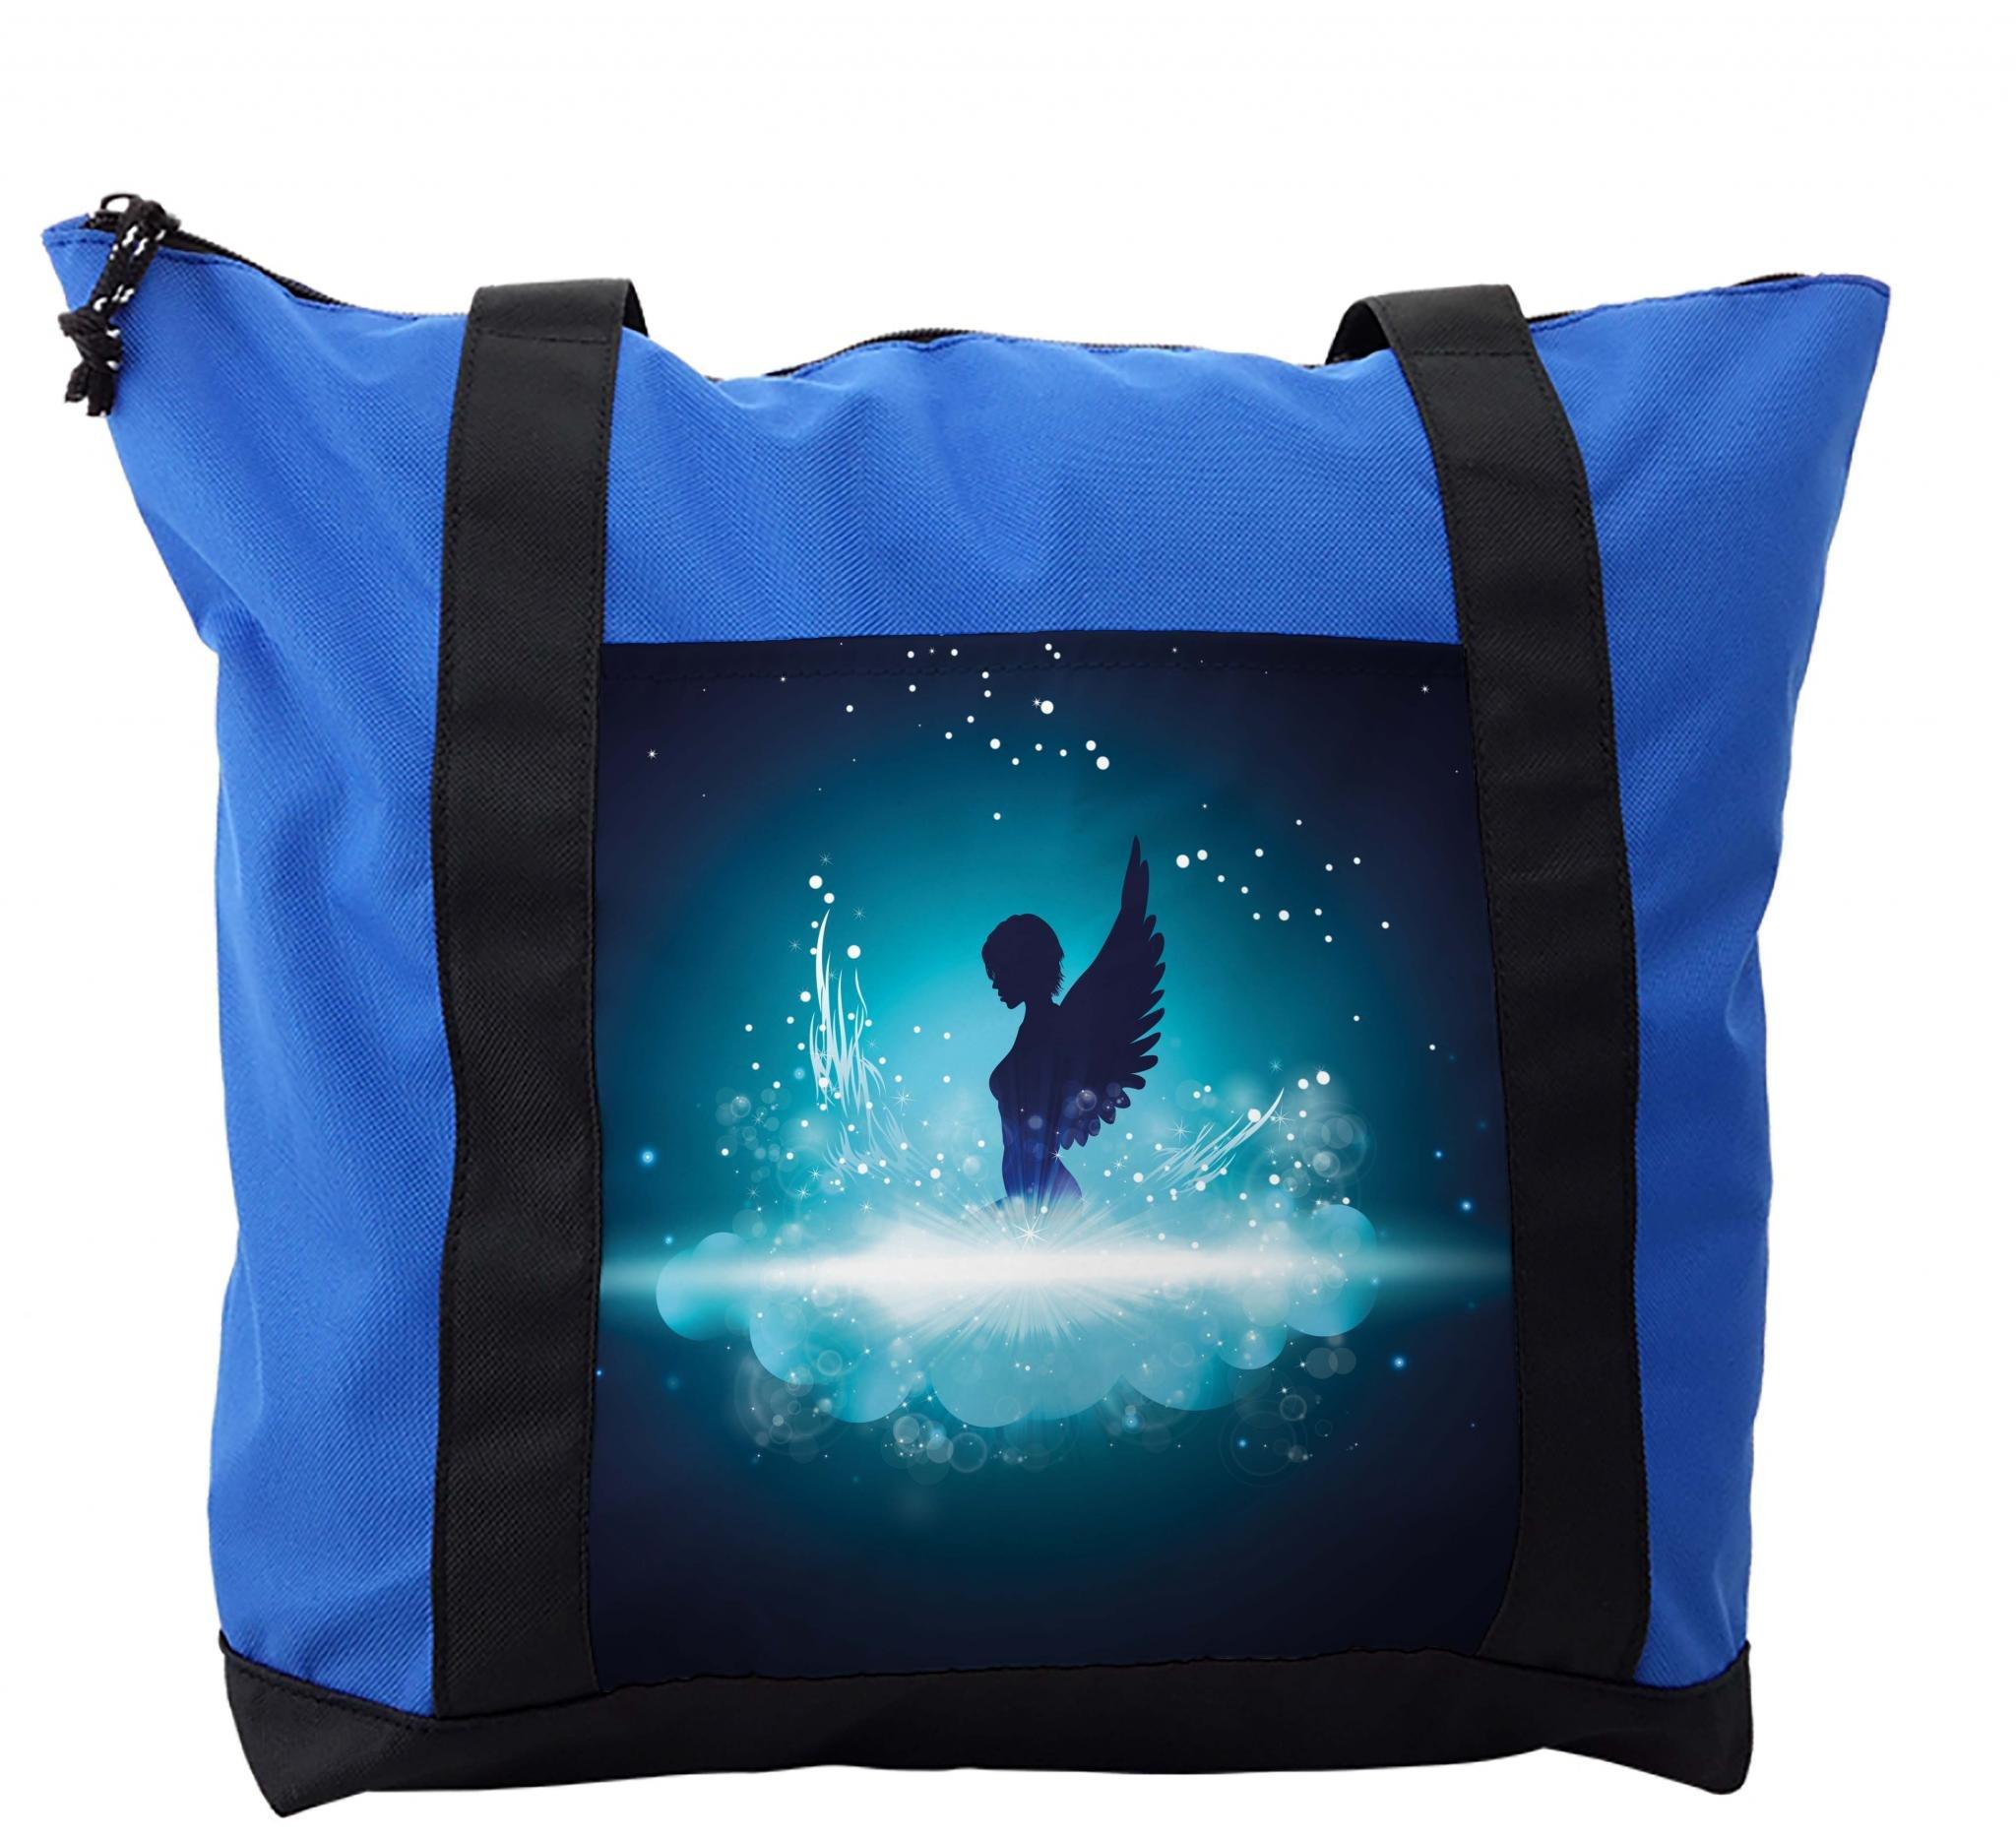 Lunarable Blue Shoulder Bag, Angel Woman Silhouette Wings, Durable with Zipper